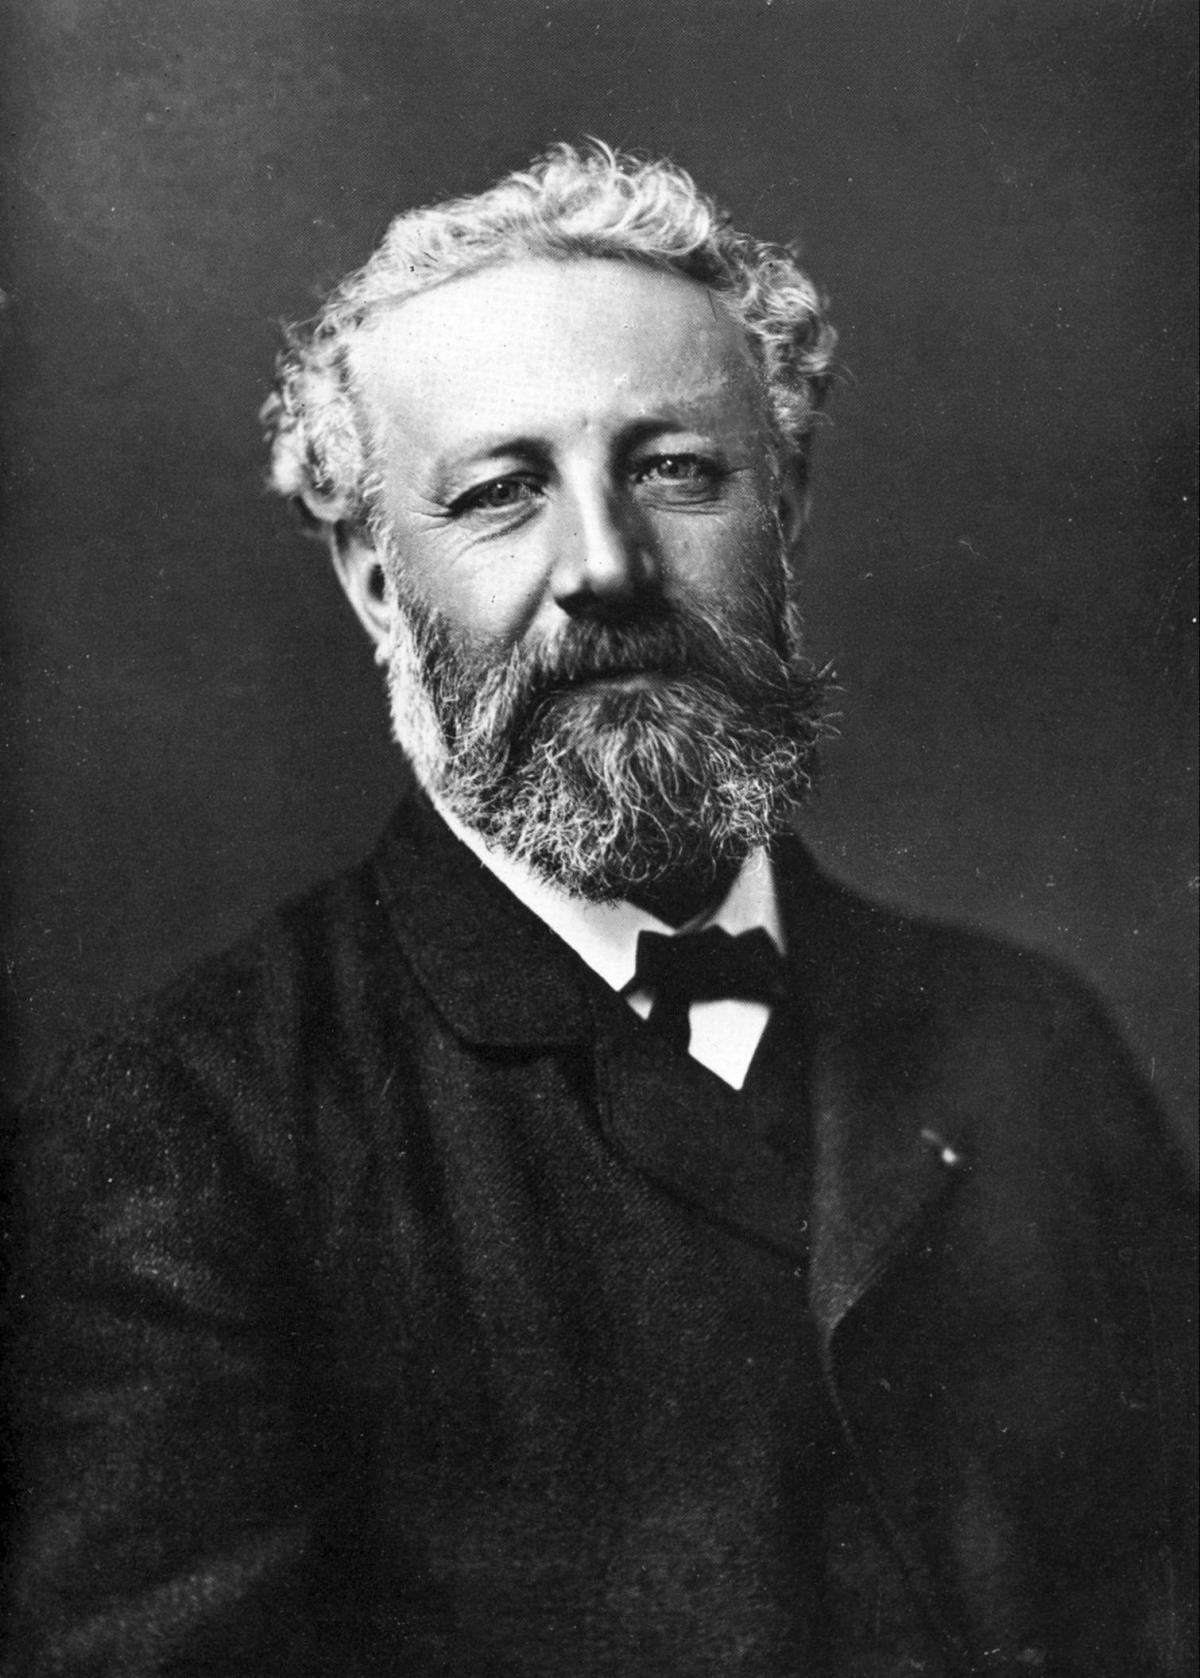 Jules Verne : voyageur imaginaire